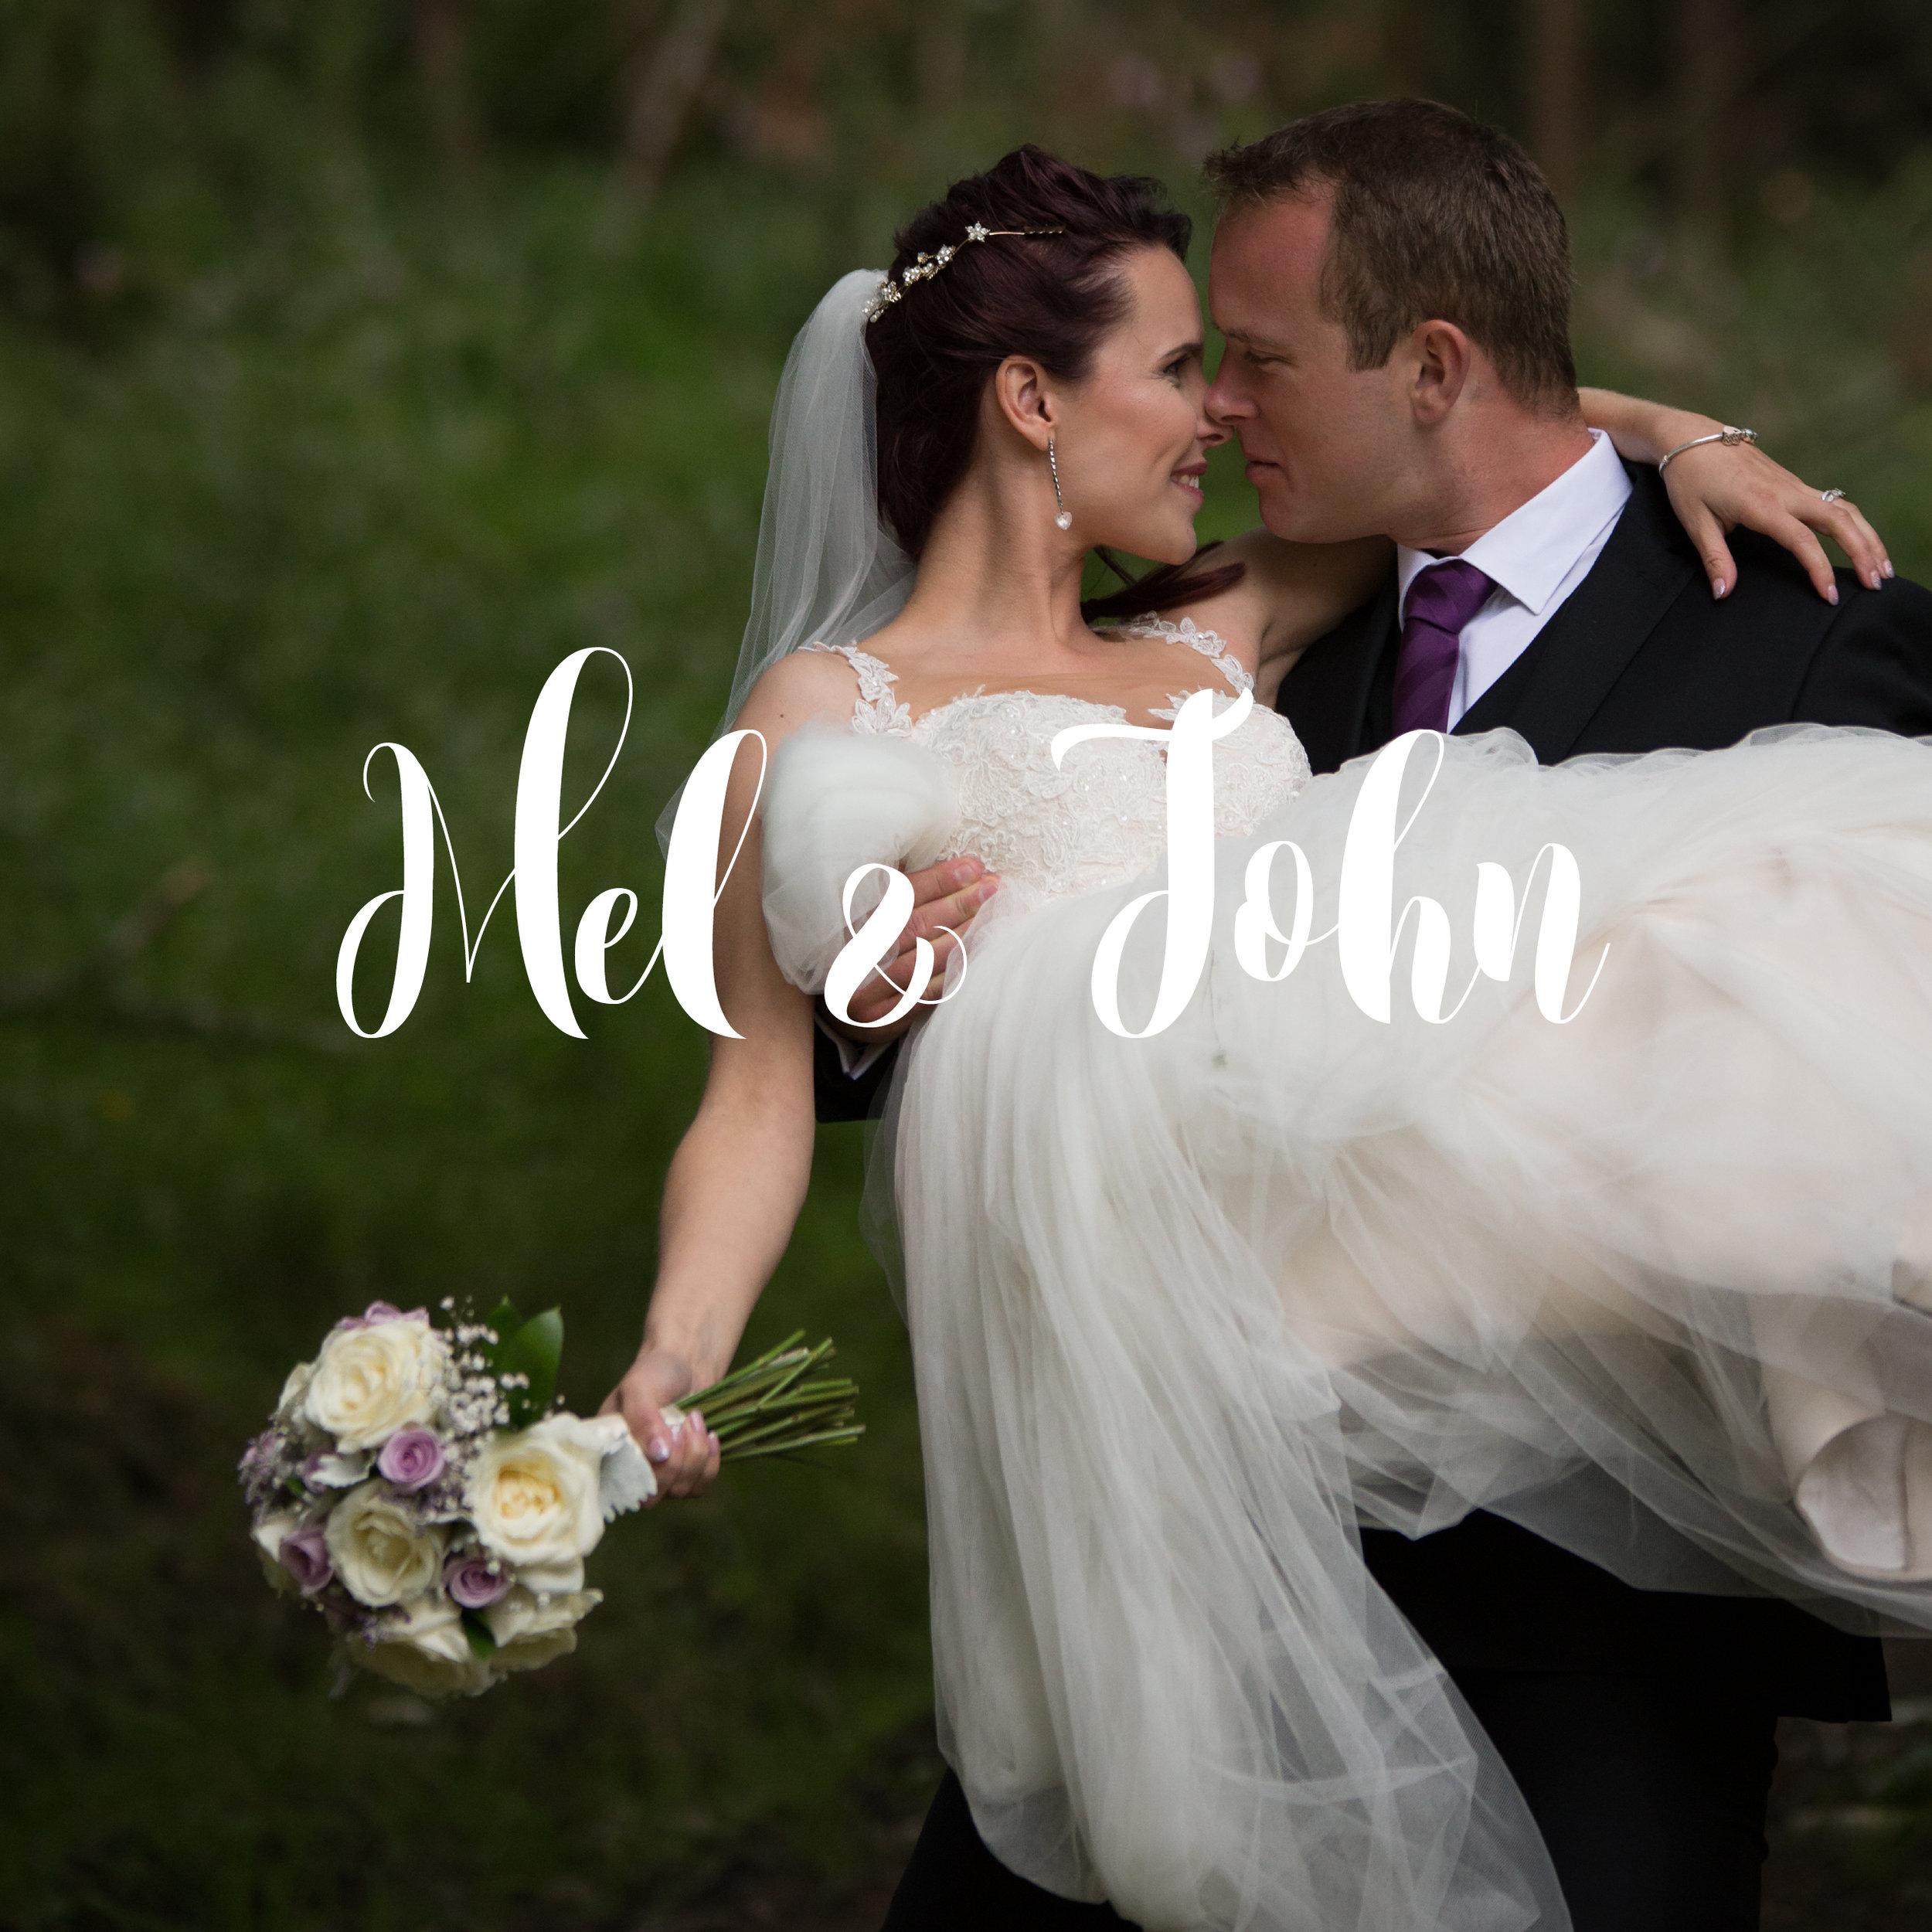 highlight-wedding-photography-new-zealand-meljohn